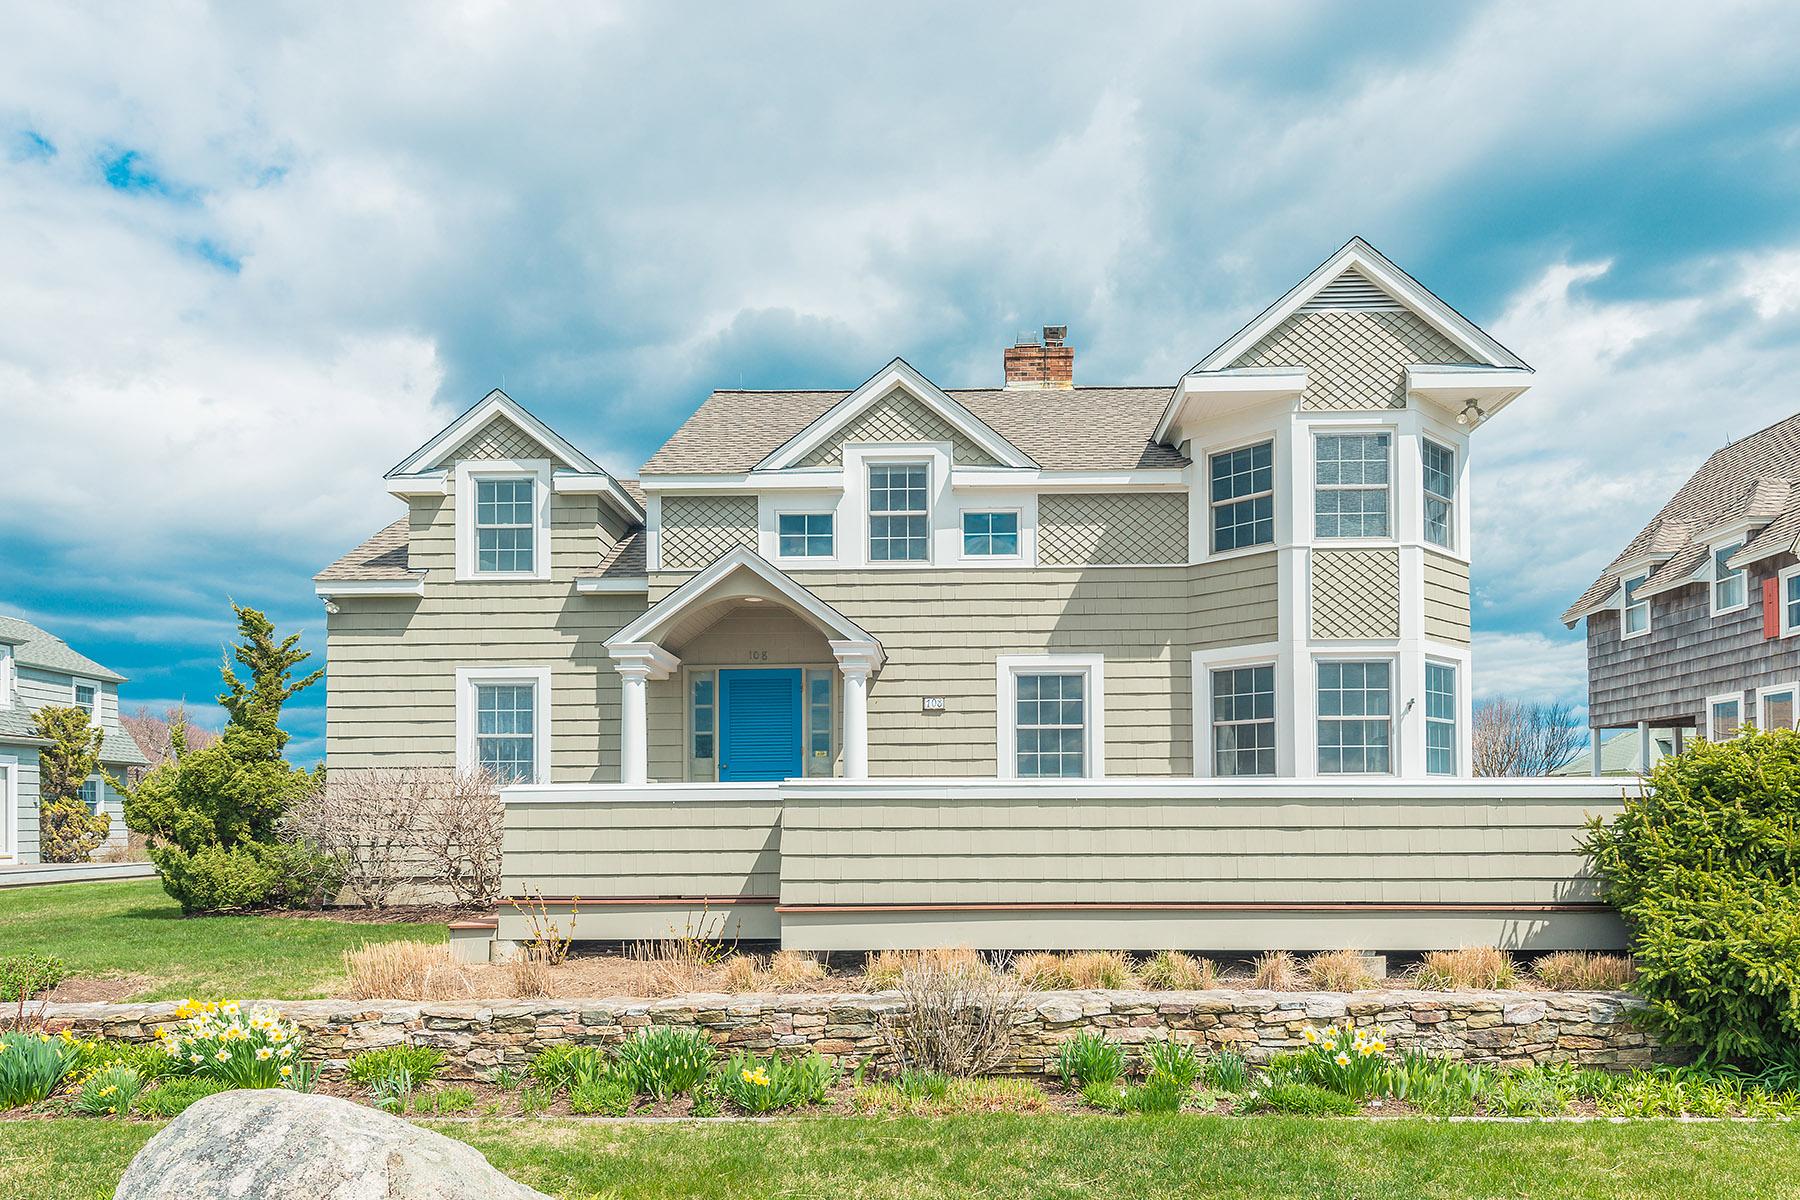 Villa per Vendita alle ore 108 Noyes Neck Road 108 Noyes Neck Road Weekapaug Westerly, Rhode Island 02891 Stati Uniti